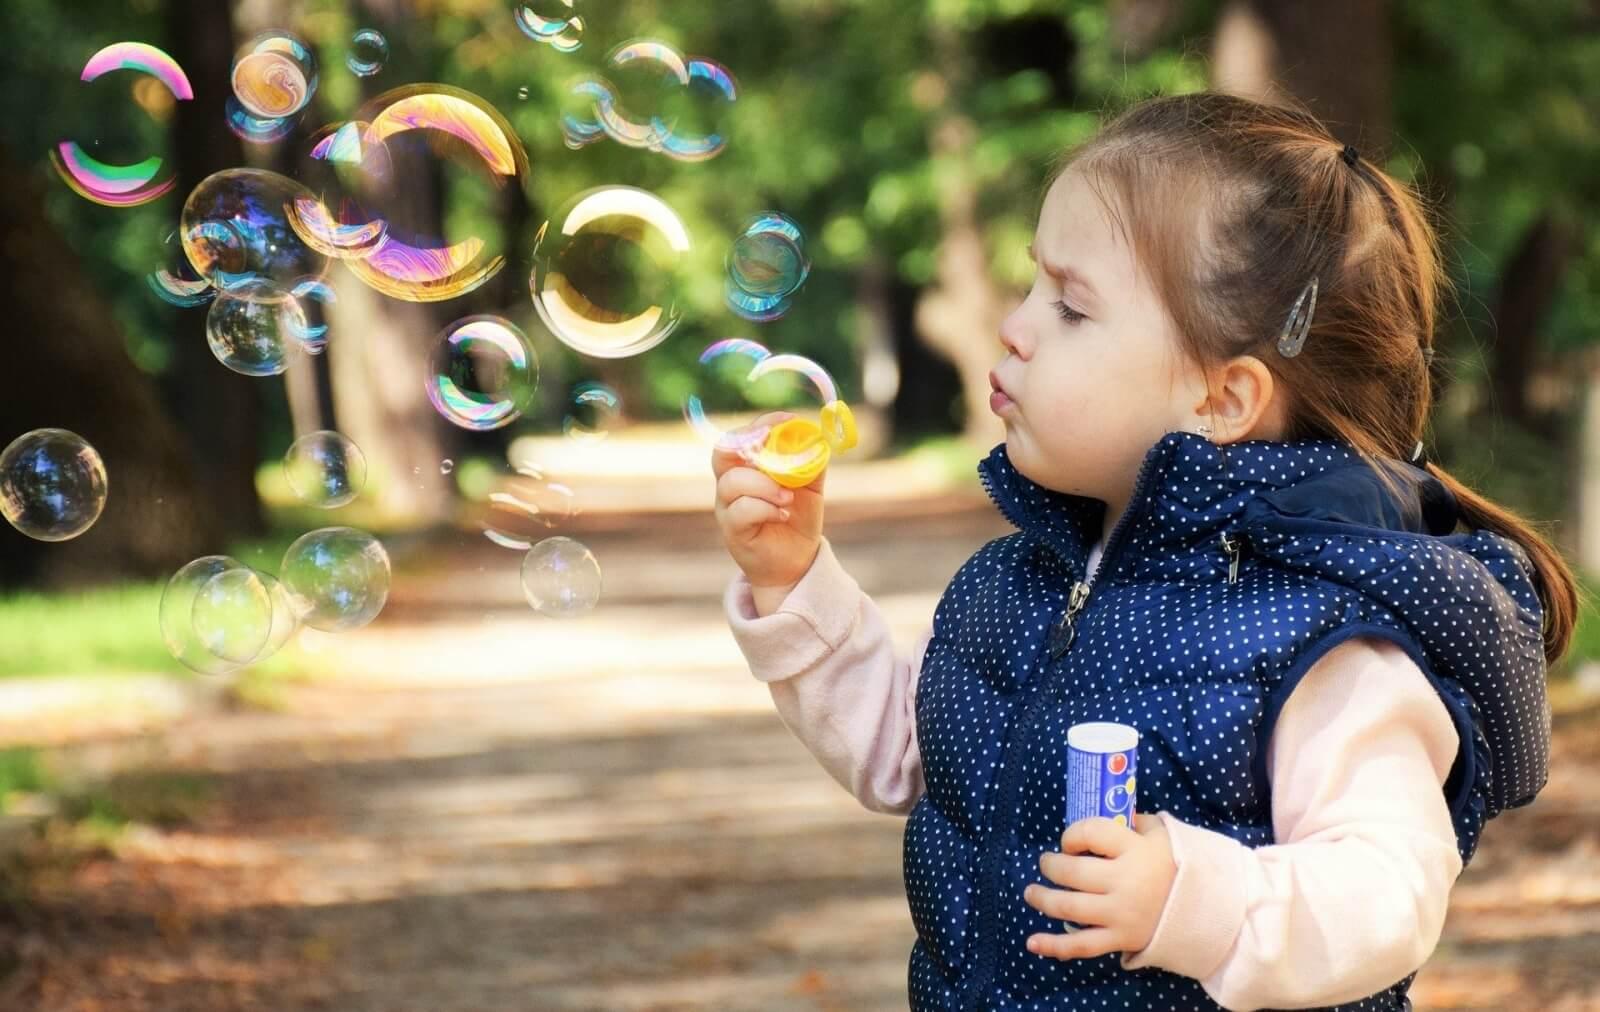 soap bubbles round in shape